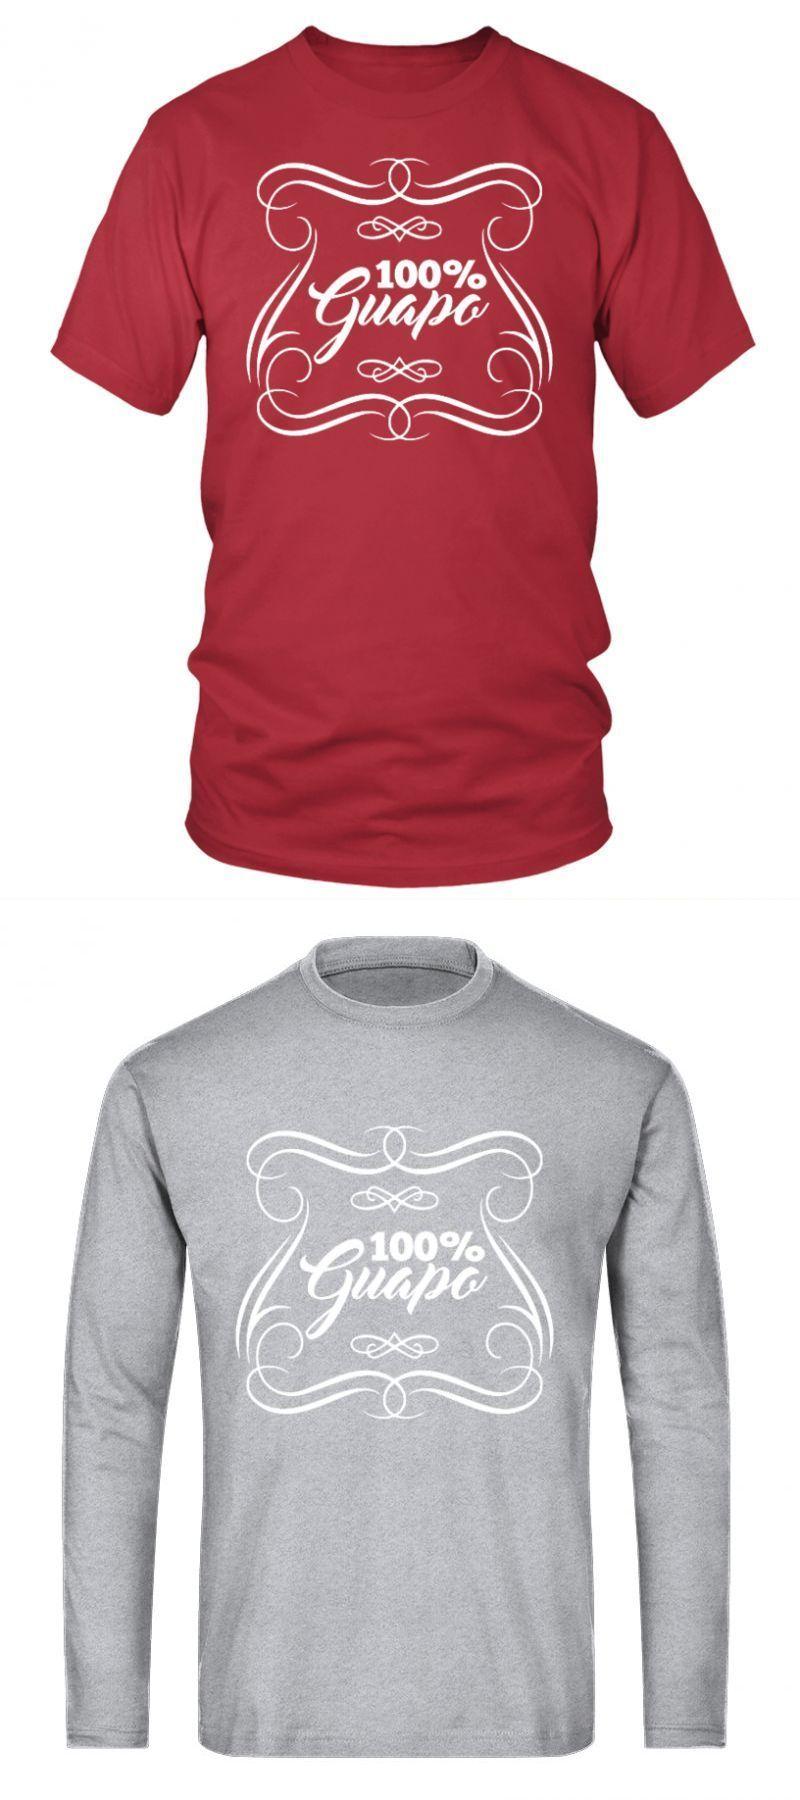 Oktoberfest T Shirt 100 Guapo Handsome Mexican Guy Oktoberfest T Shirt Herren Amazon Shirts Mexican Men Cool T Shirts